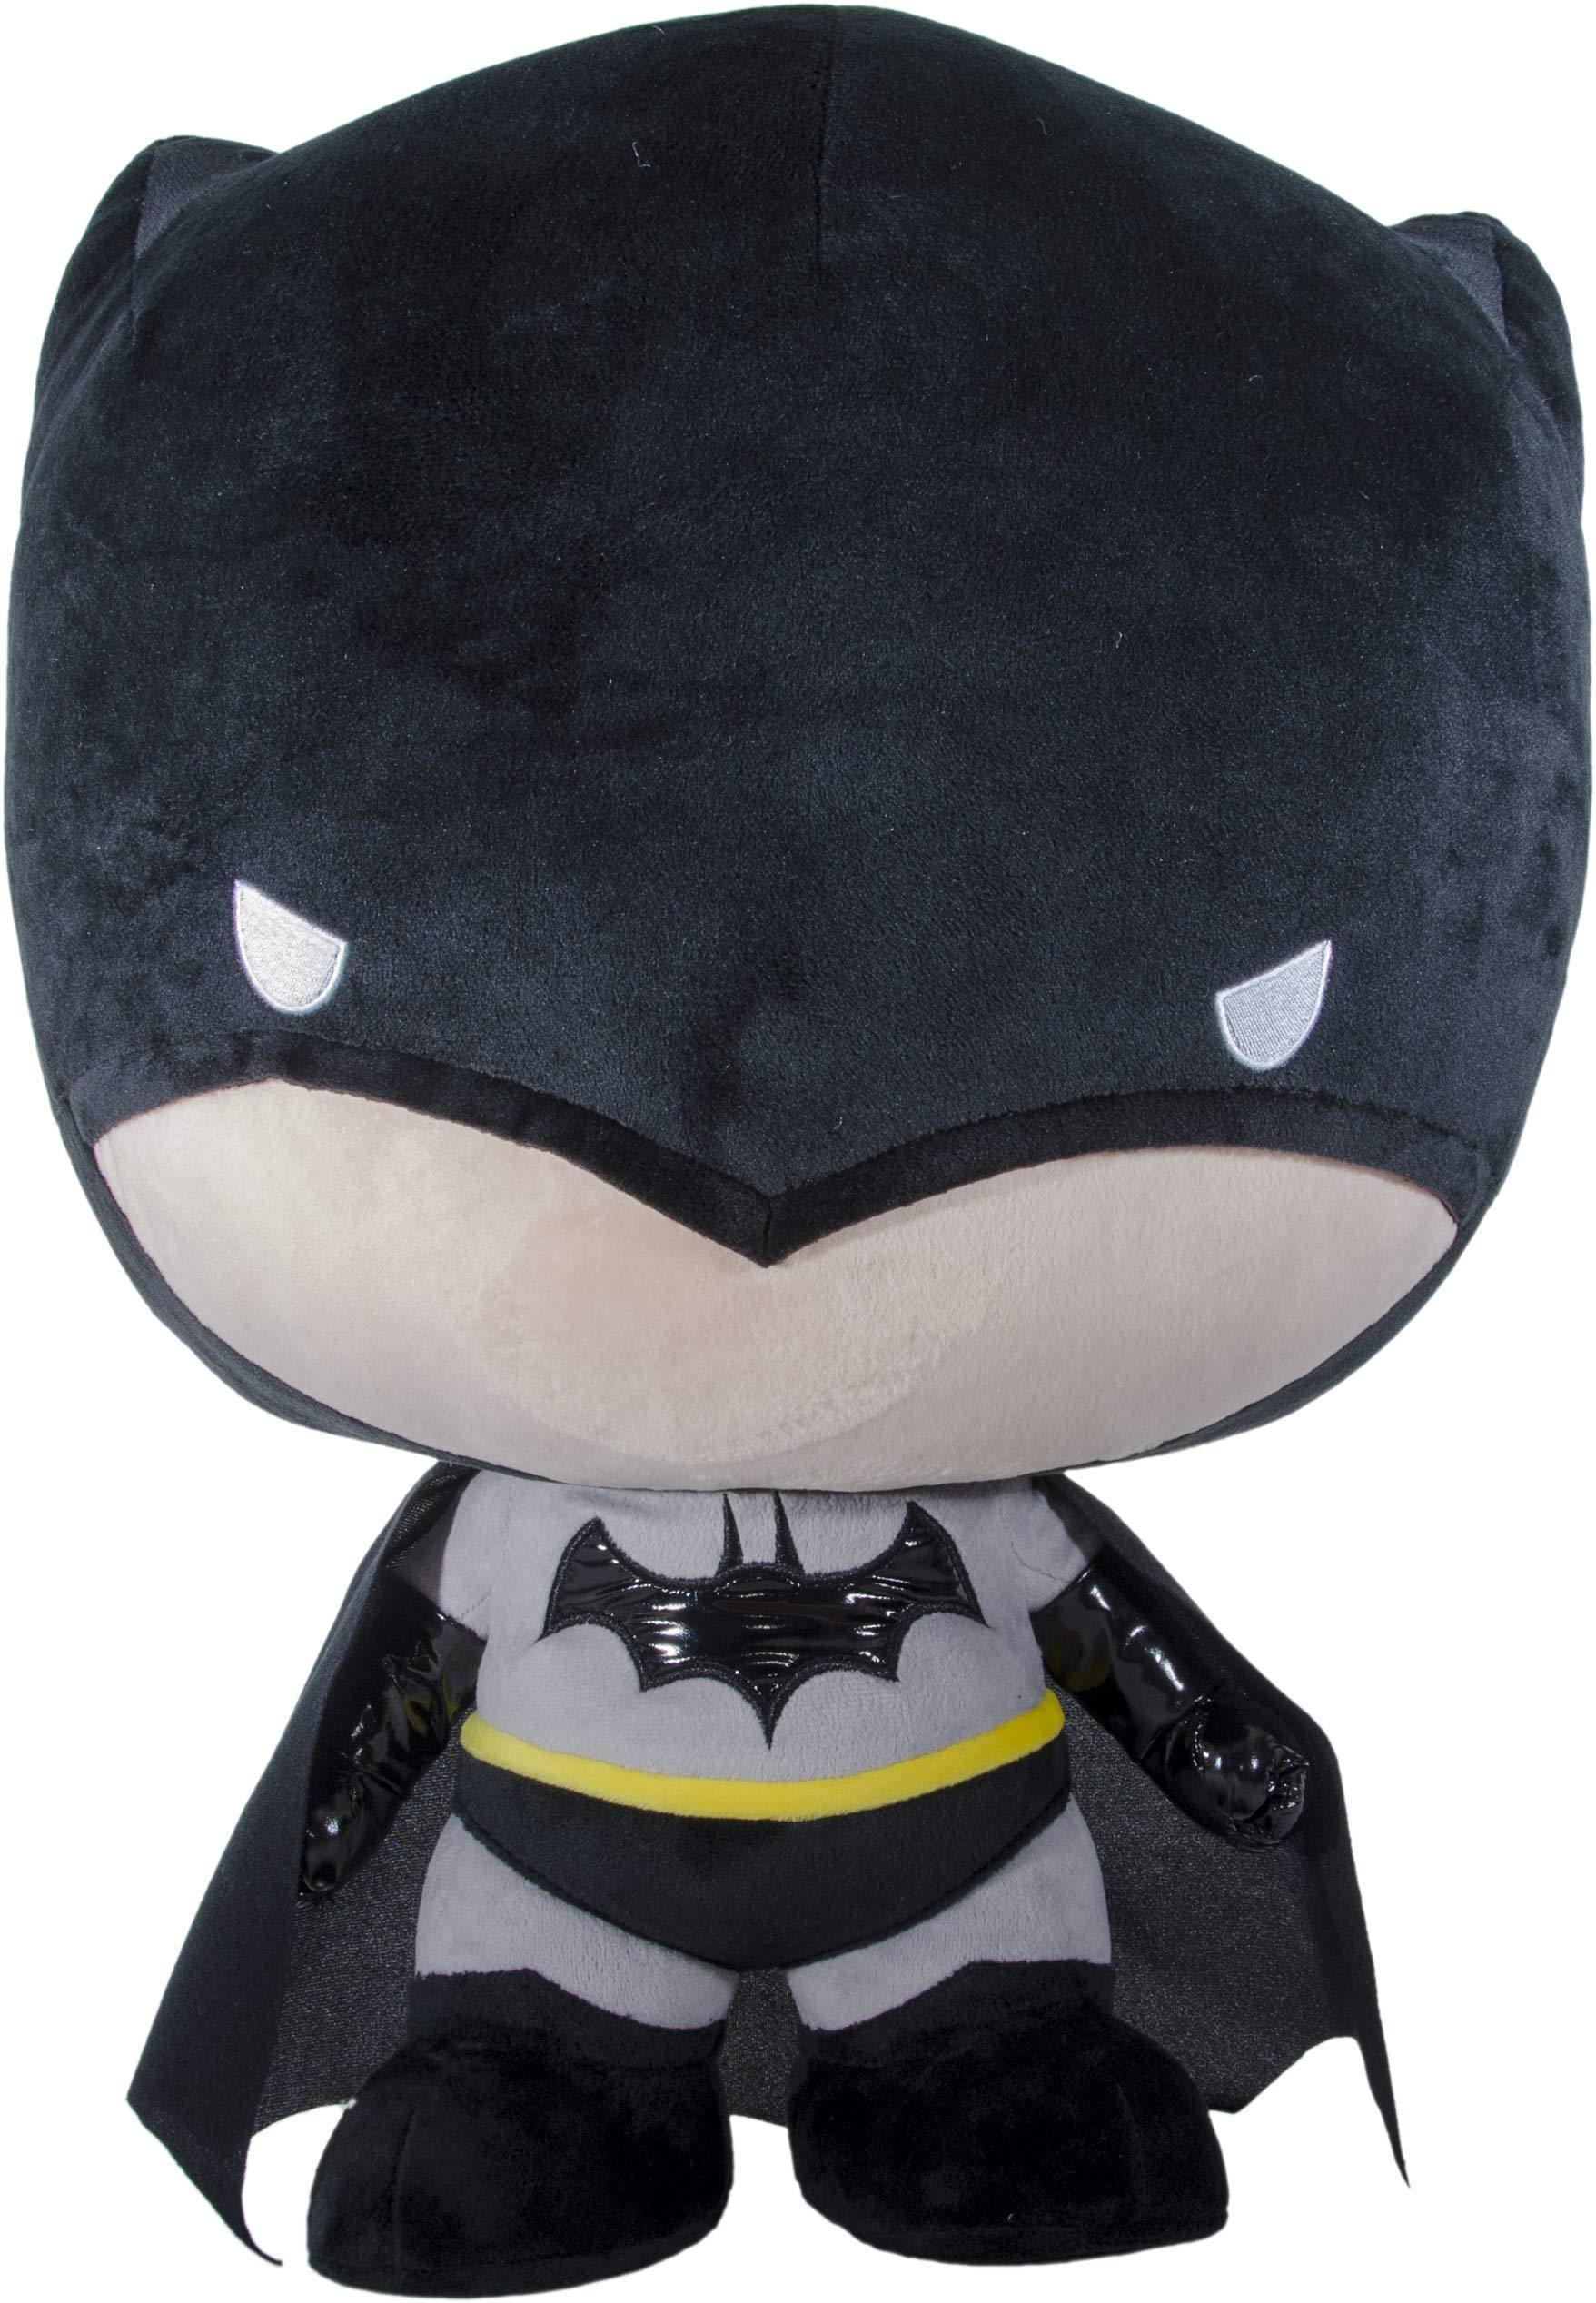 "YuMe Biggables - 36"" Giant Inflatable Plush DC Comics Dark Knight Batman, 19139"